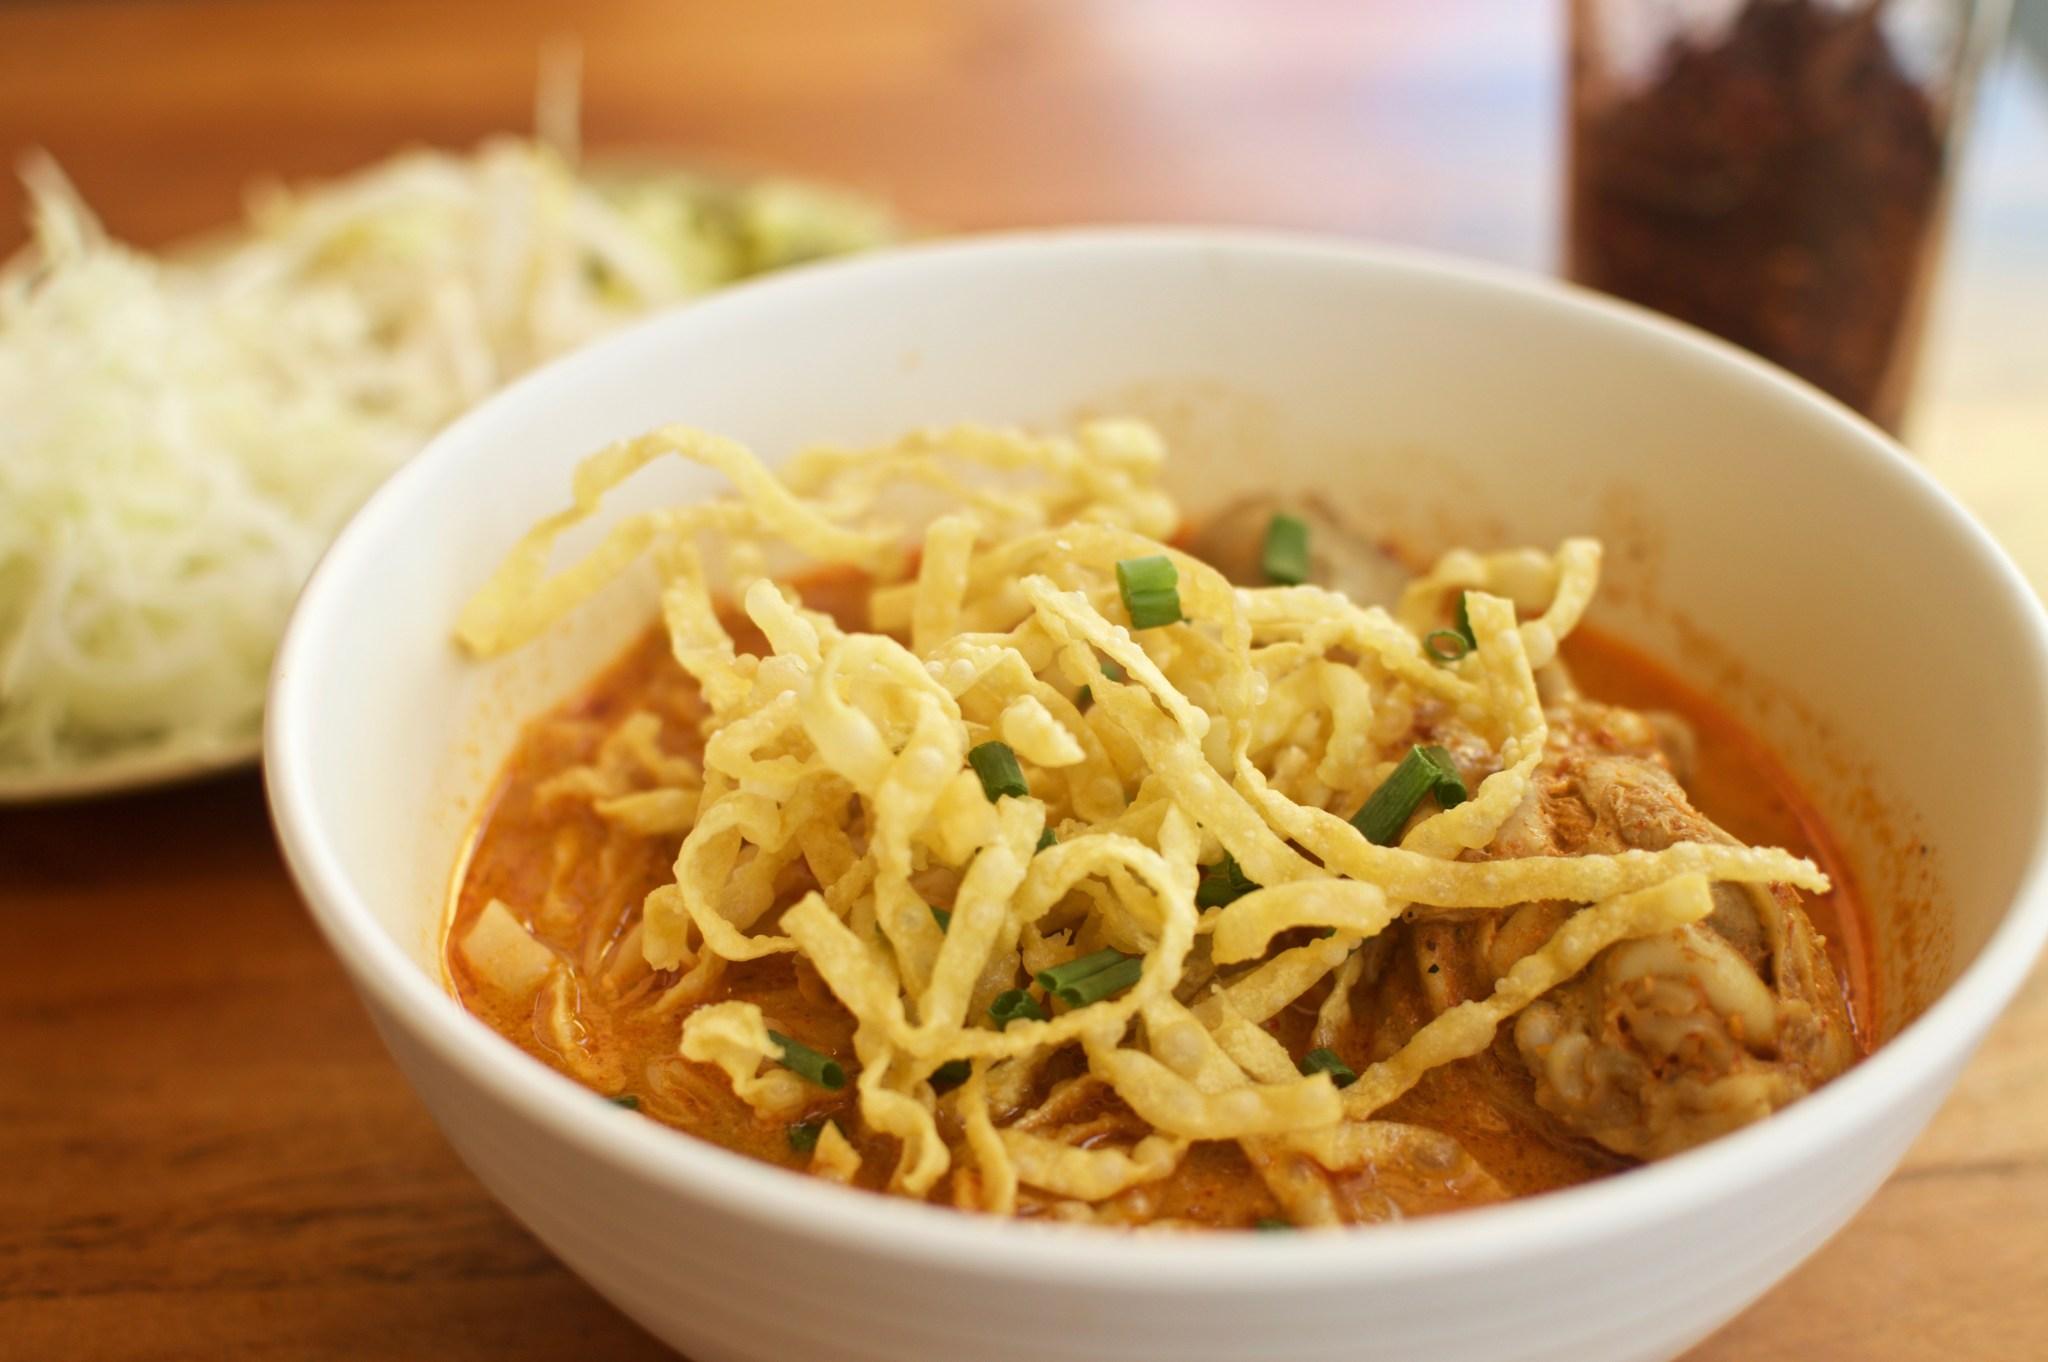 Delicious Thai food in BangkokDelicious Thai food in Bangkok